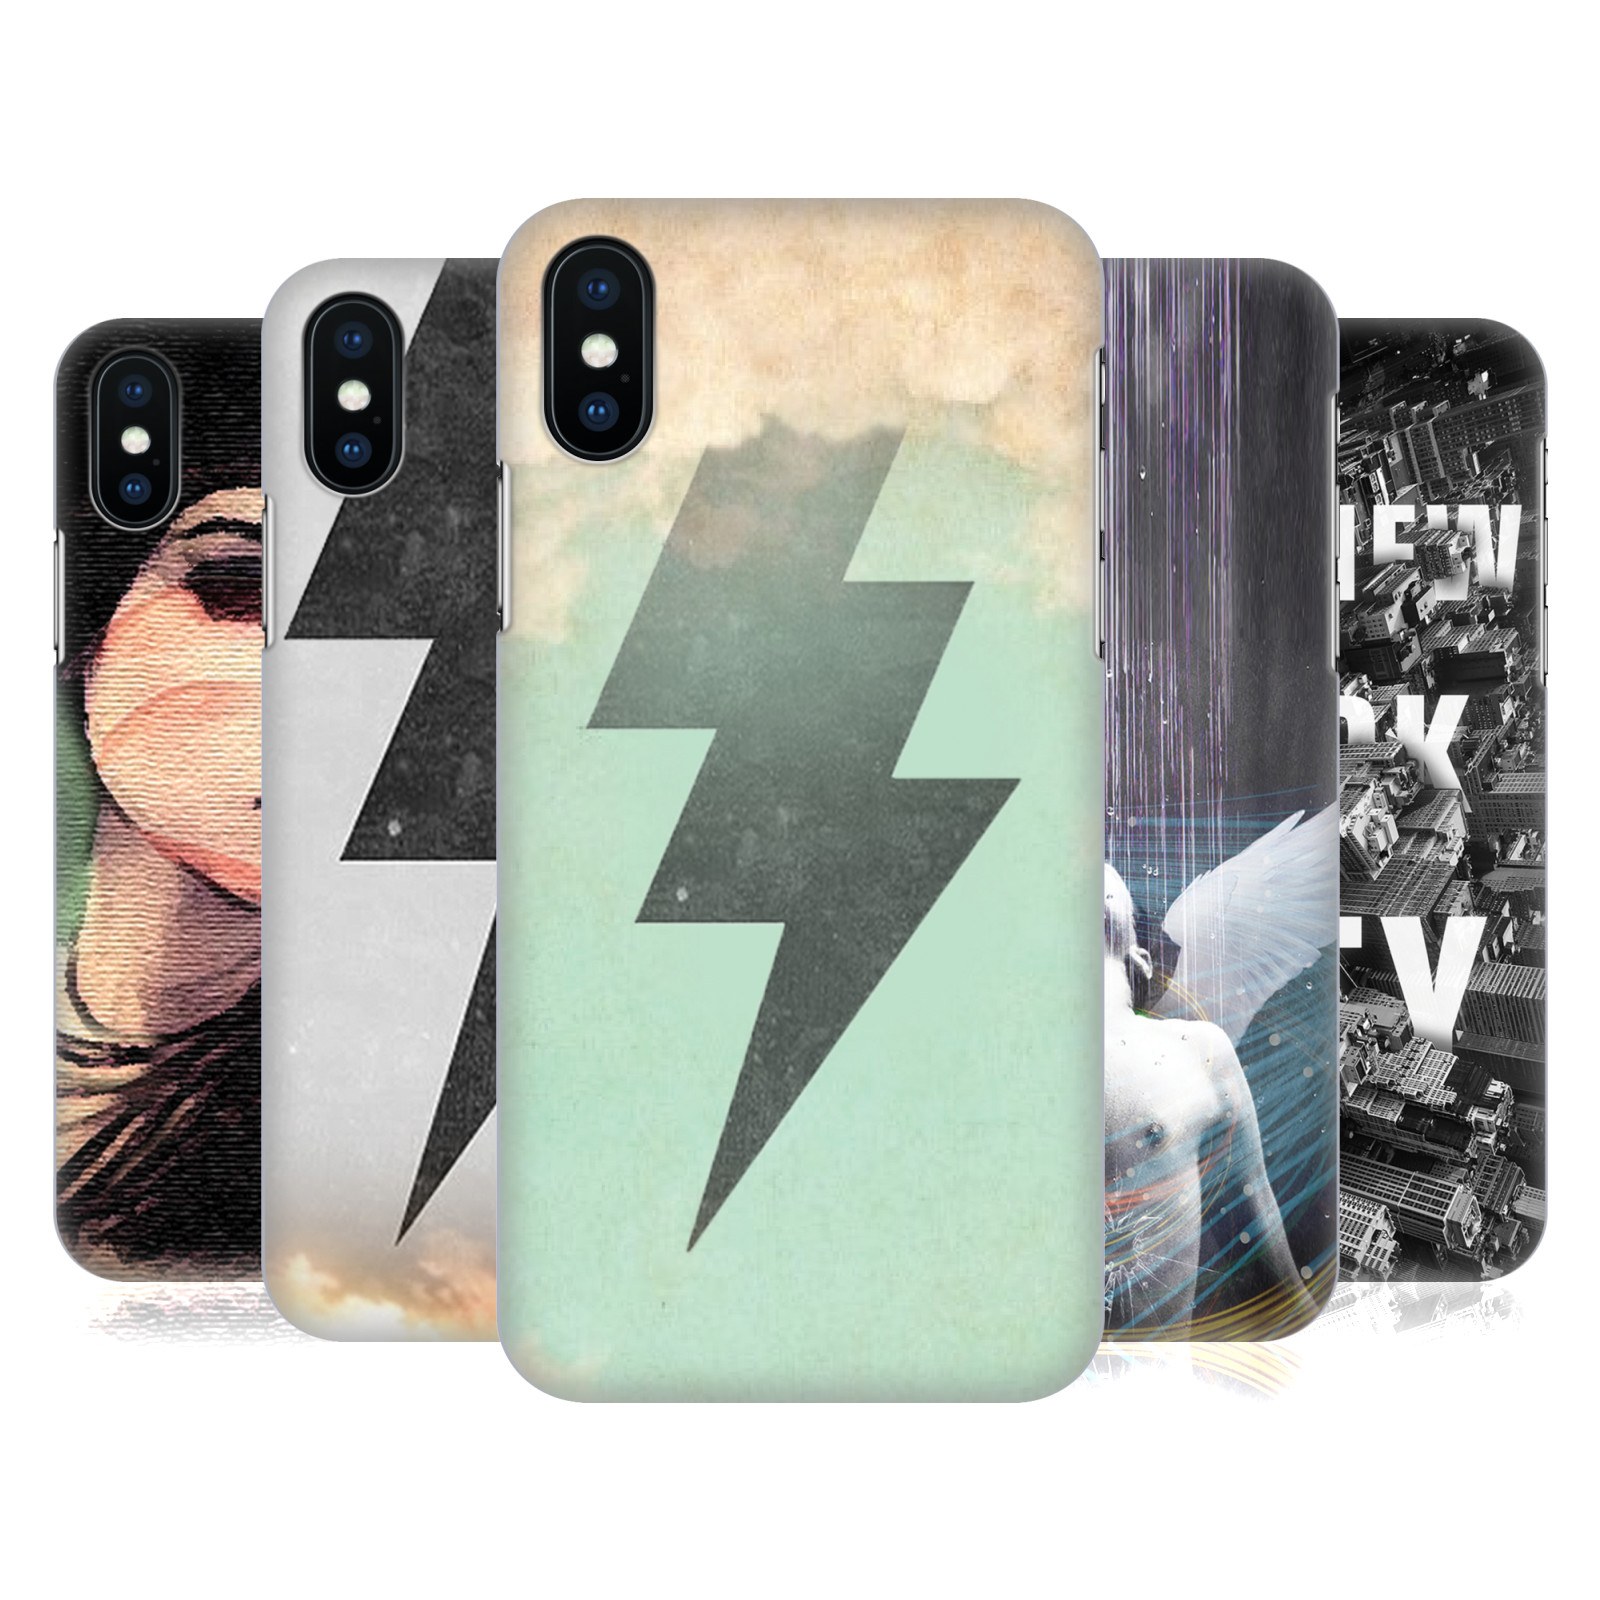 Vin Zzep Designs